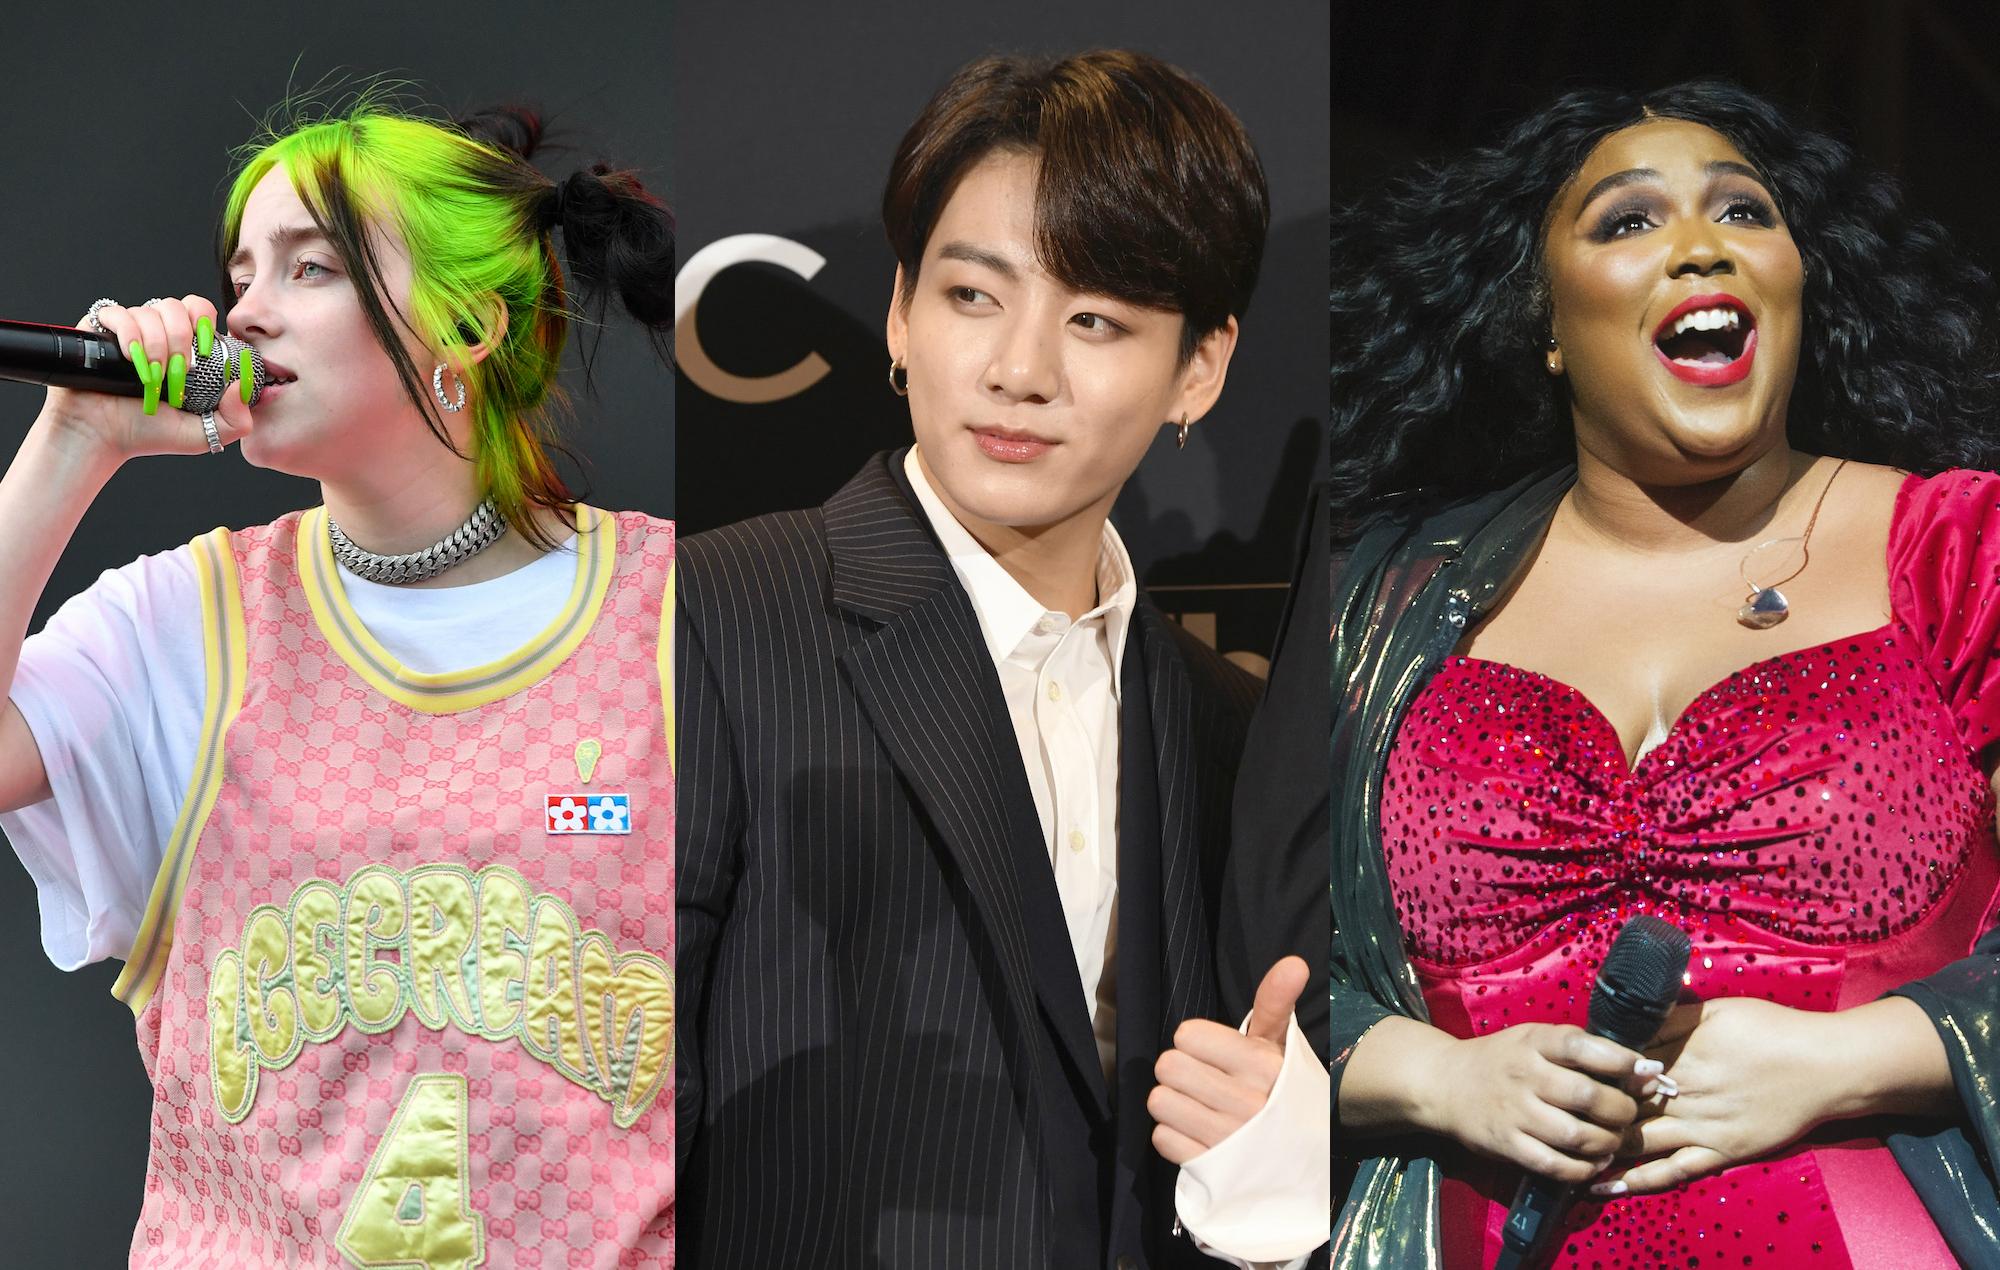 Grammys 2020 nominations: A Billie Eilish clean sweep, BTS snub and Lizzo shocker